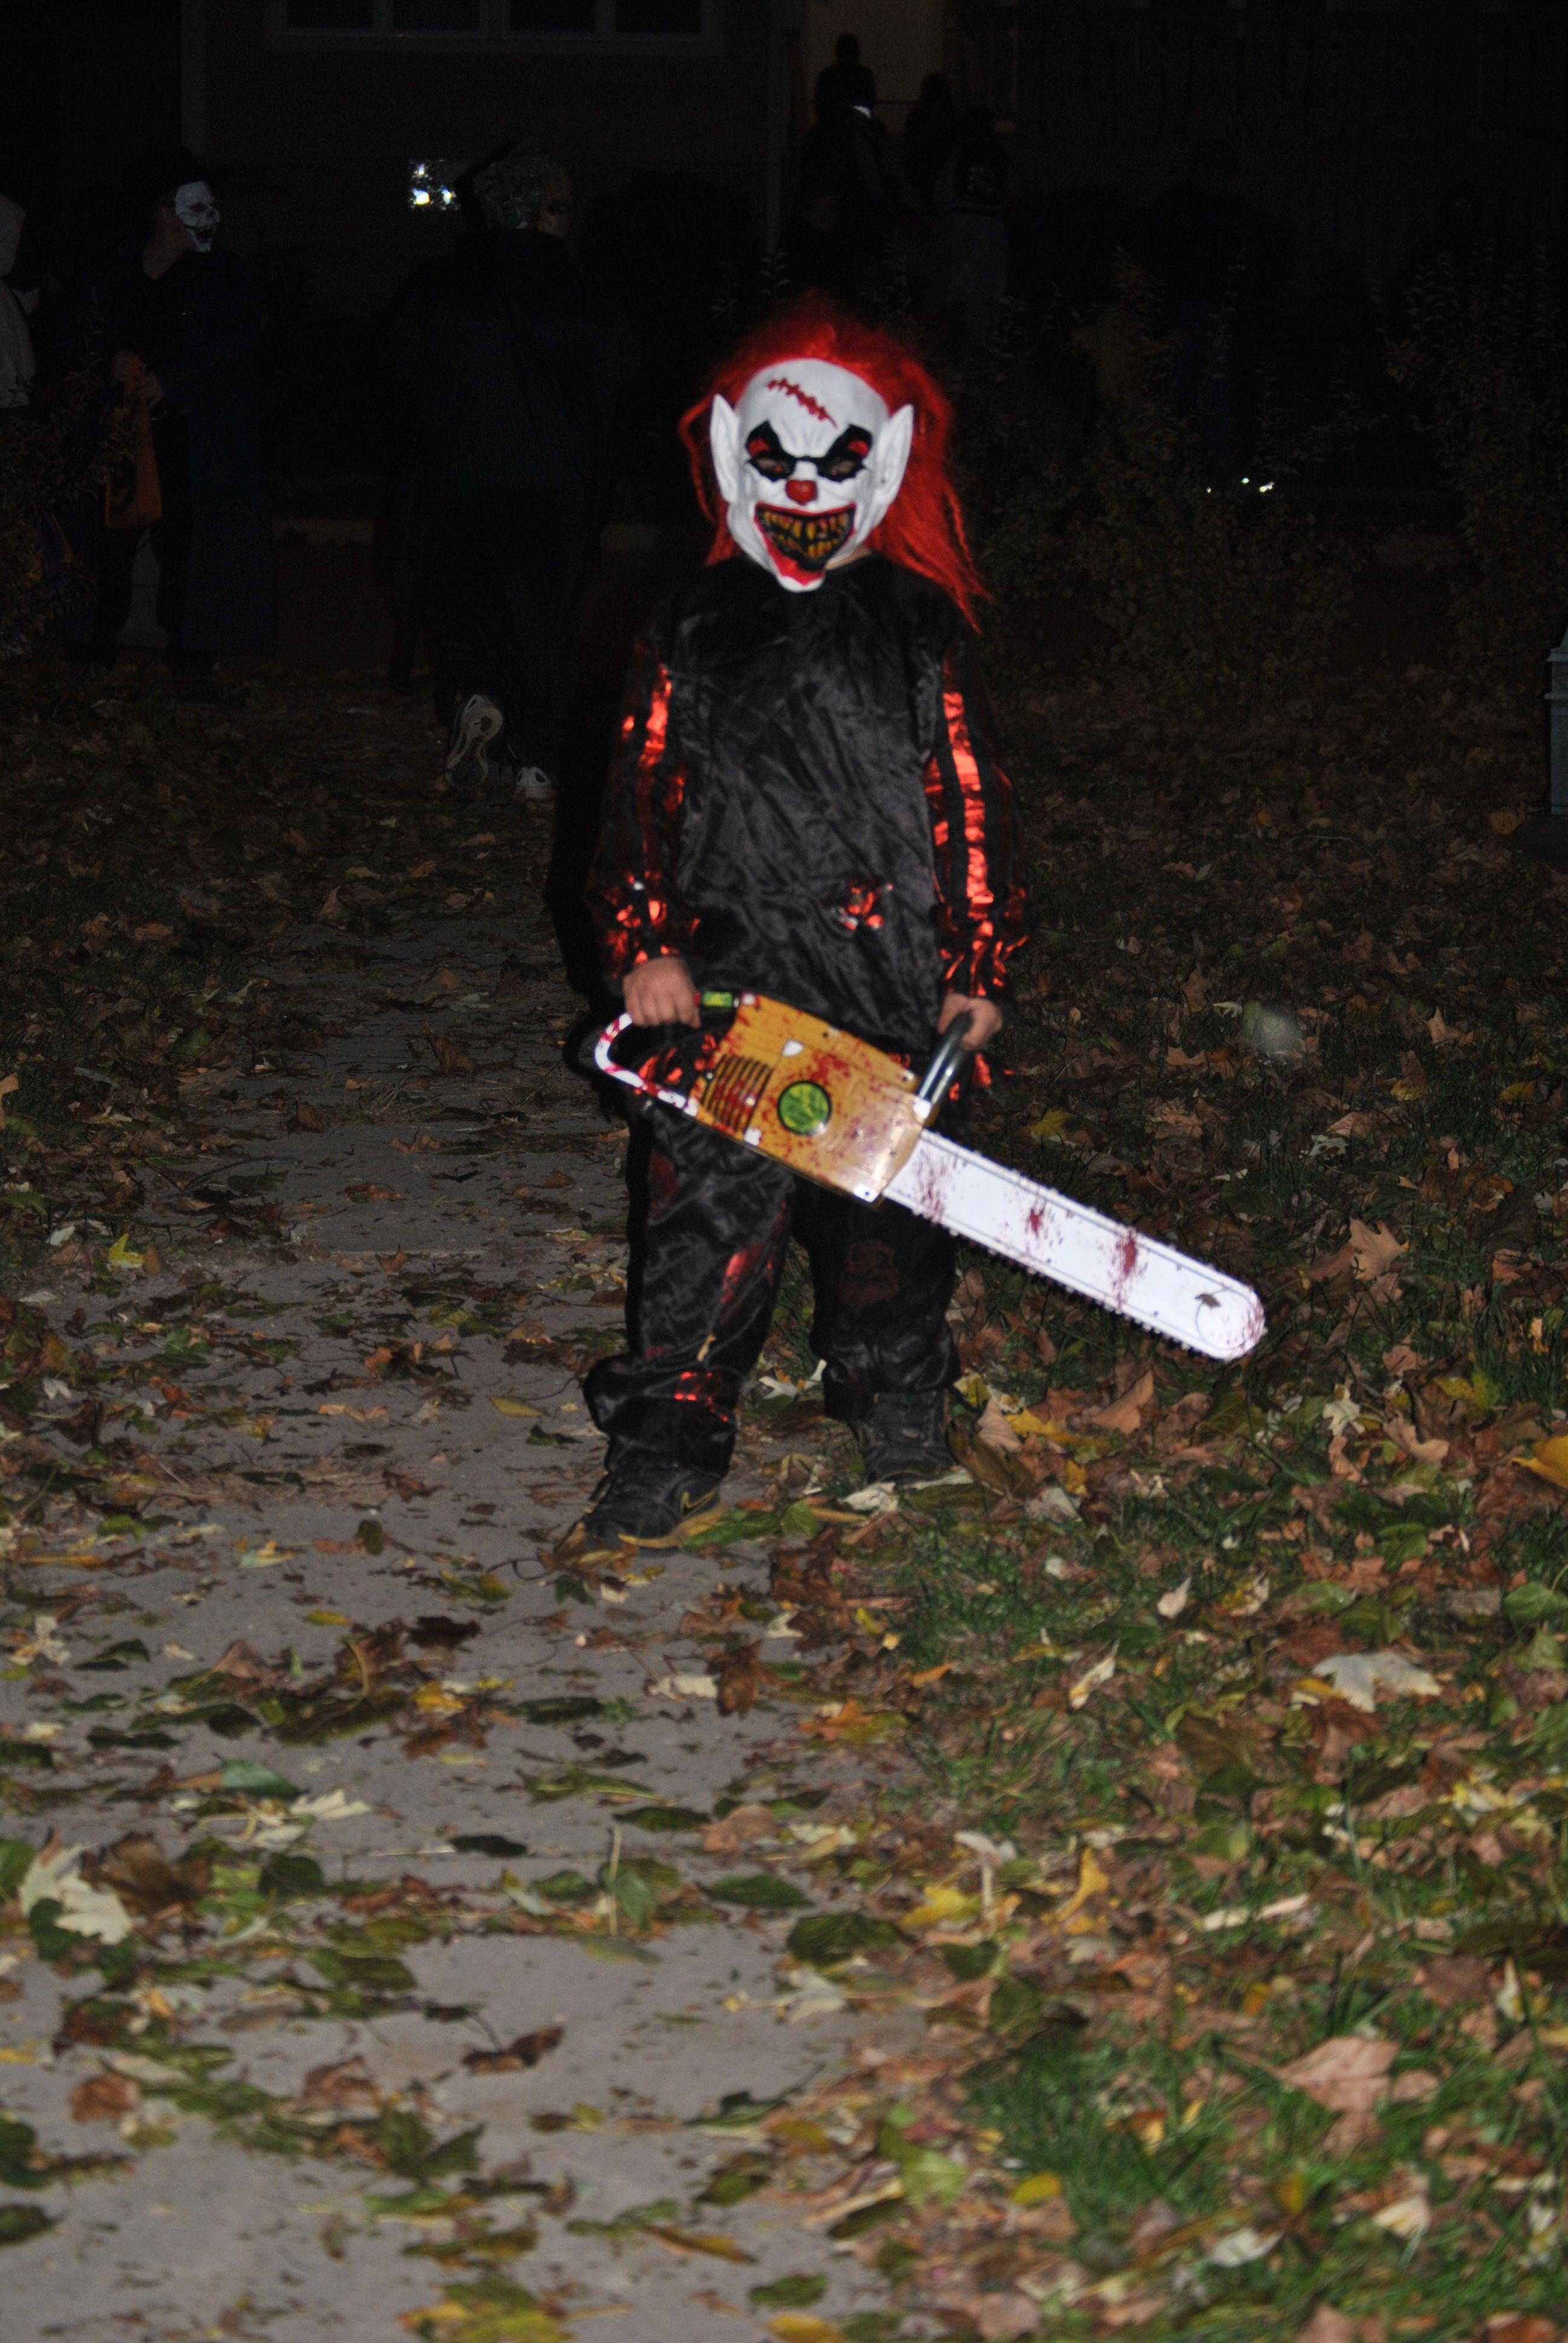 Scary Kid Halloween Costume Scary Kids Halloween Costumes Halloween Kids Halloween Costumes For Kids